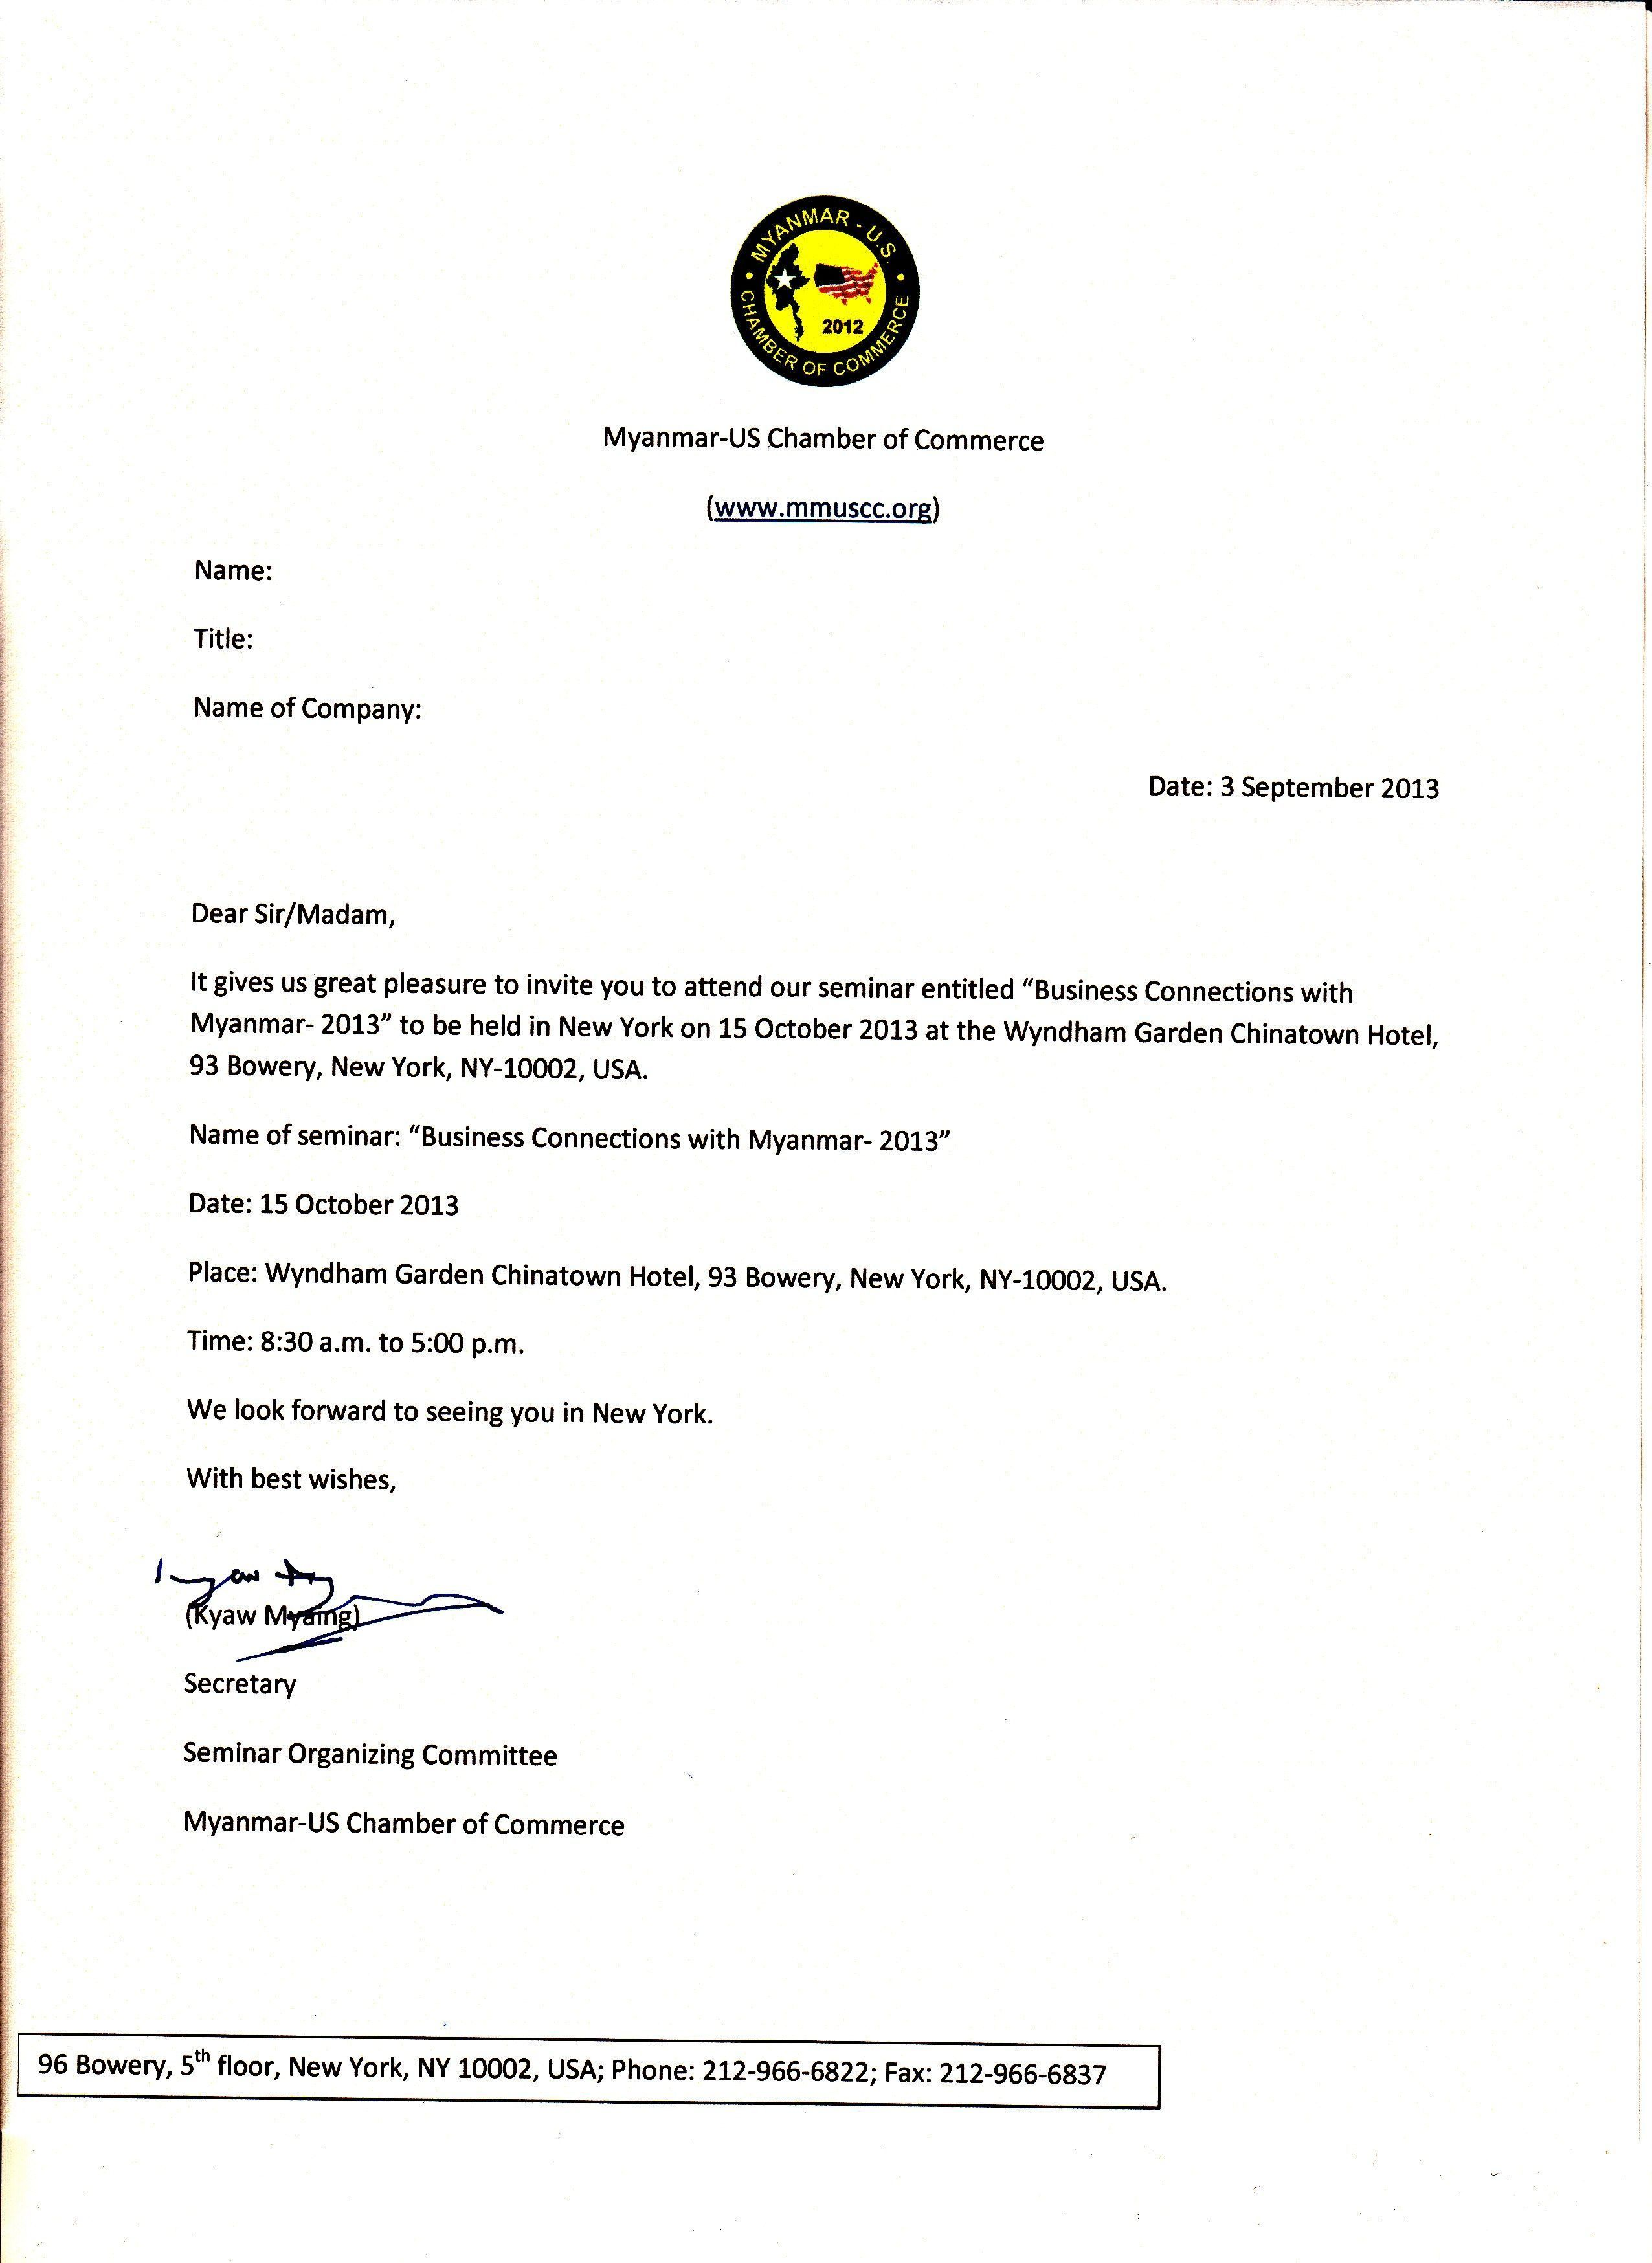 Sample Vip Invitation Letter Event Check more at www